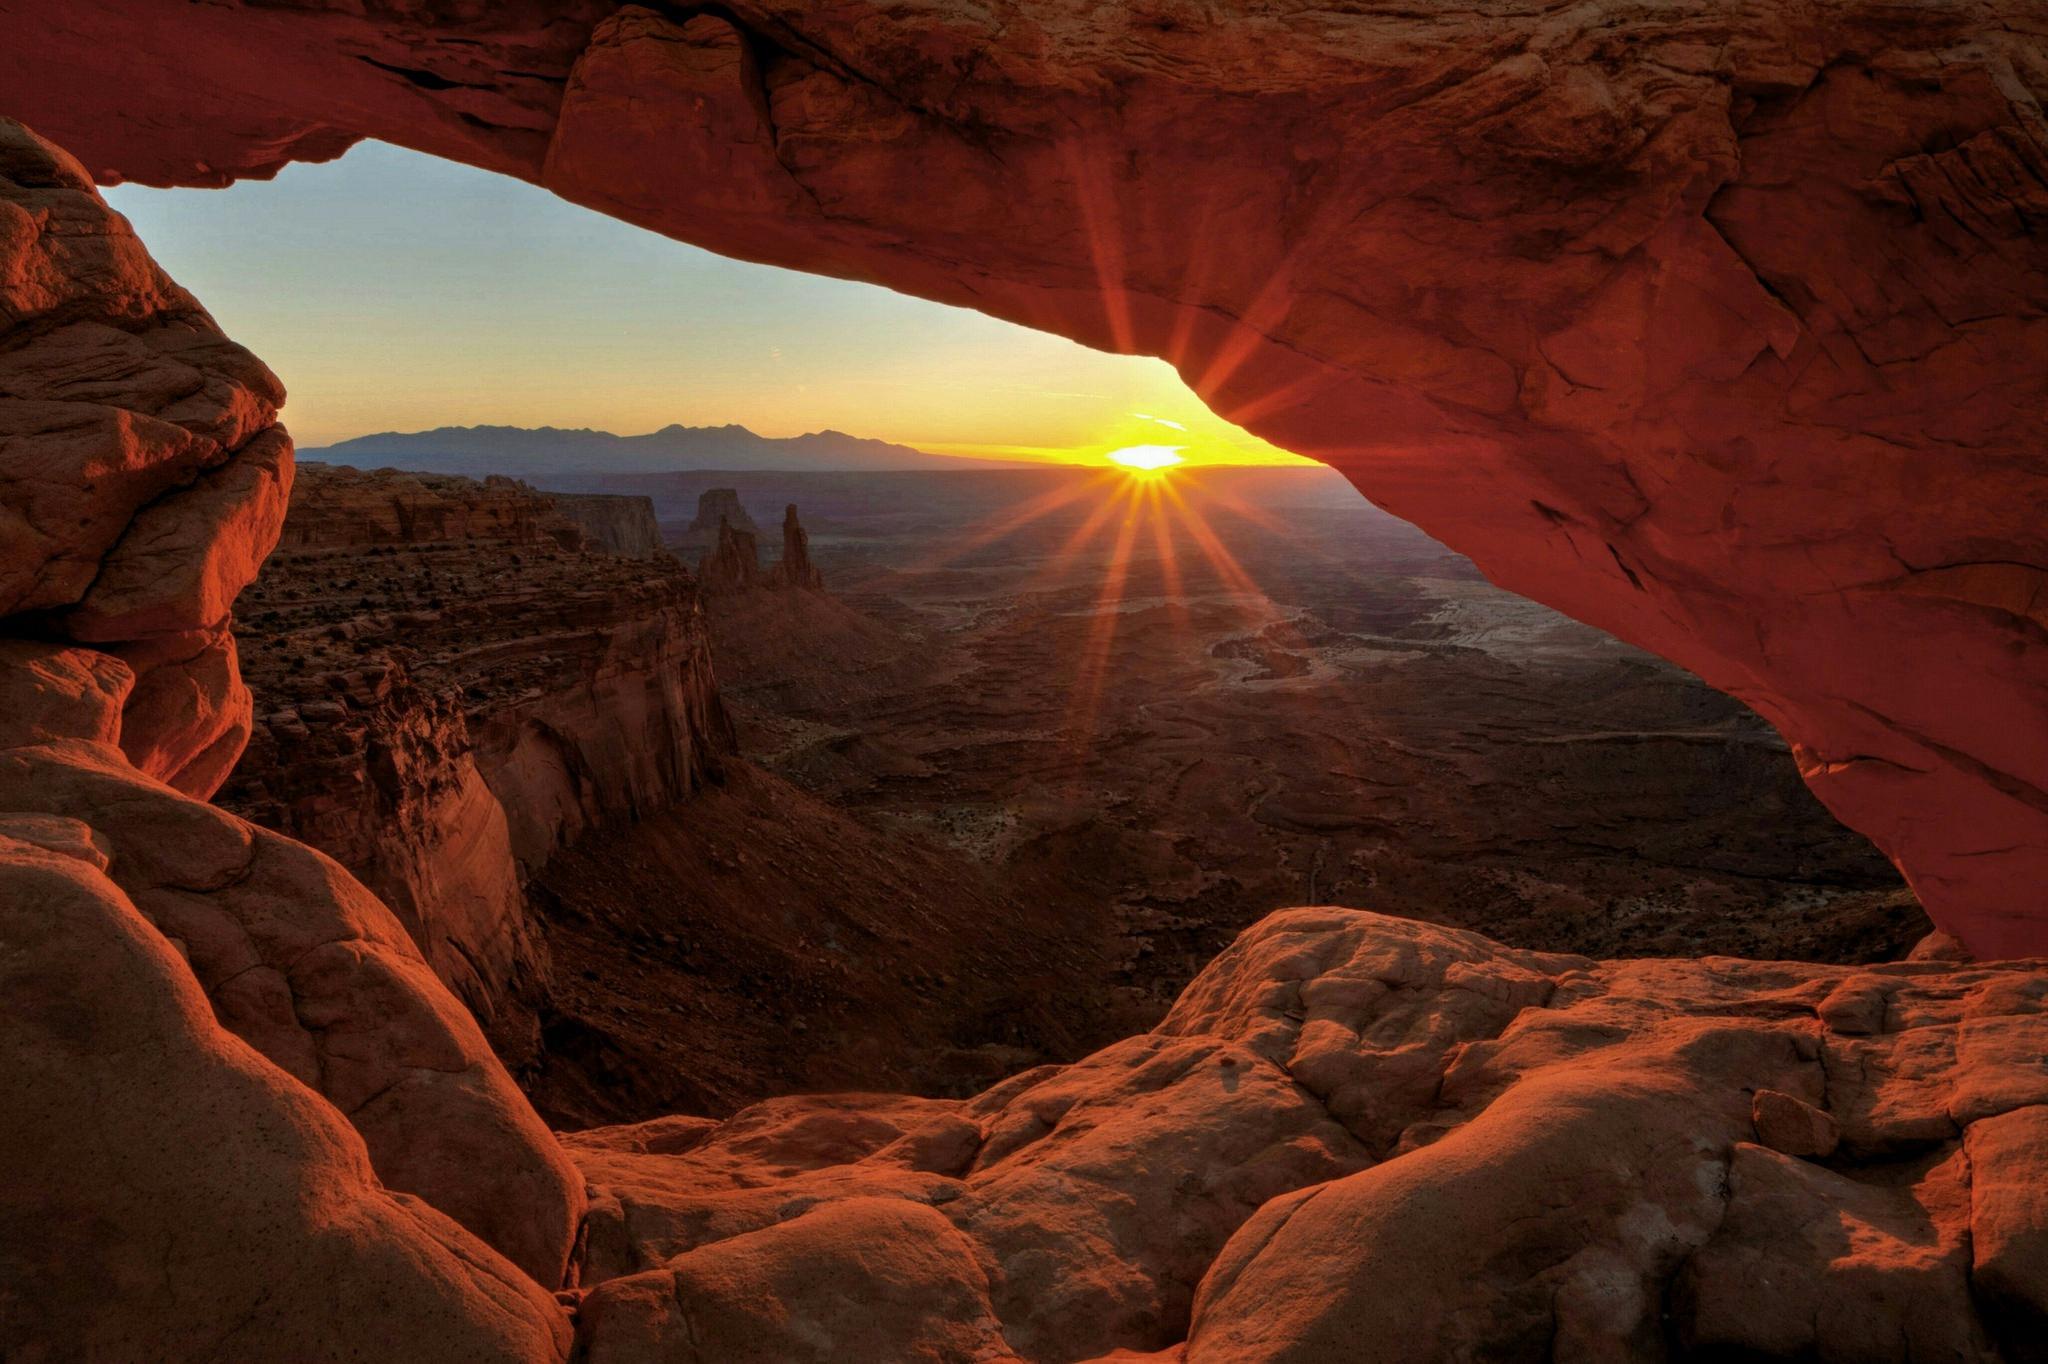 солнце каньон песок the sun canyon sand  № 2562951 бесплатно